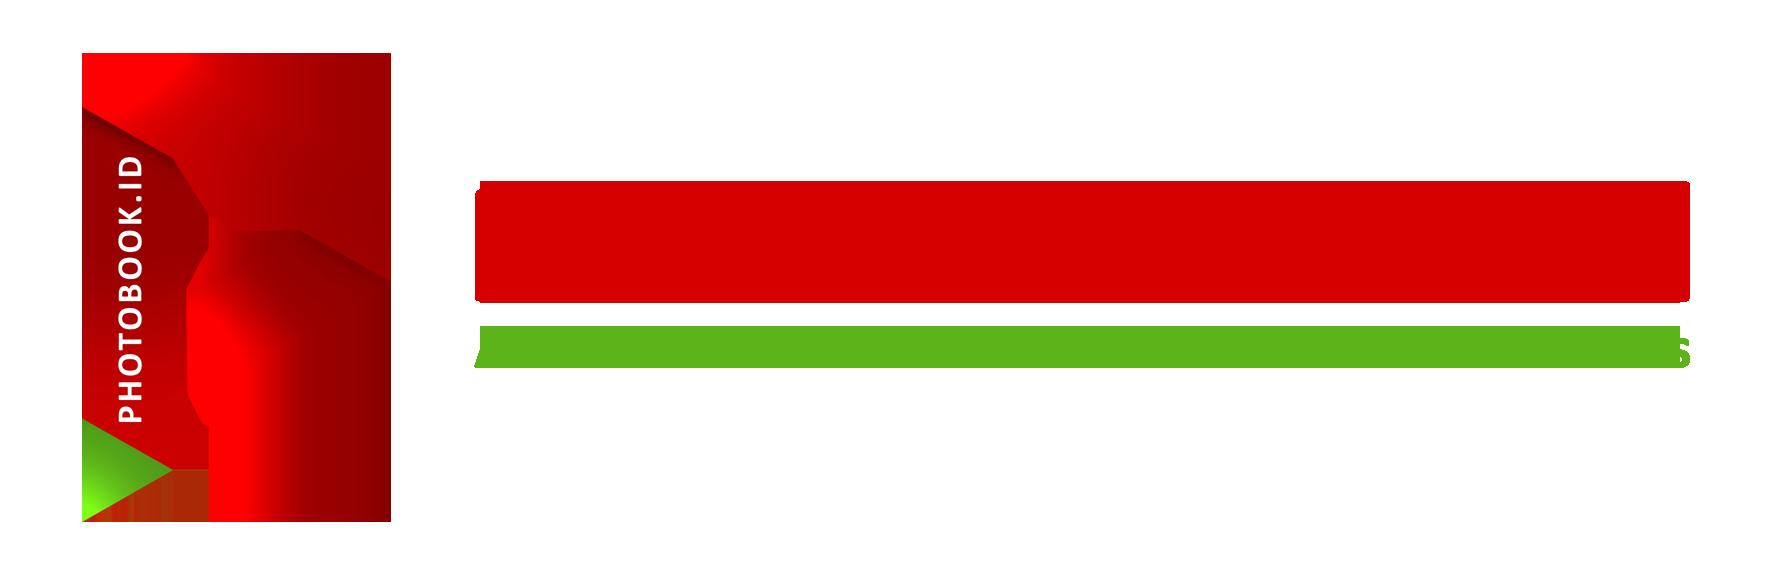 PHOTOBOOK.id